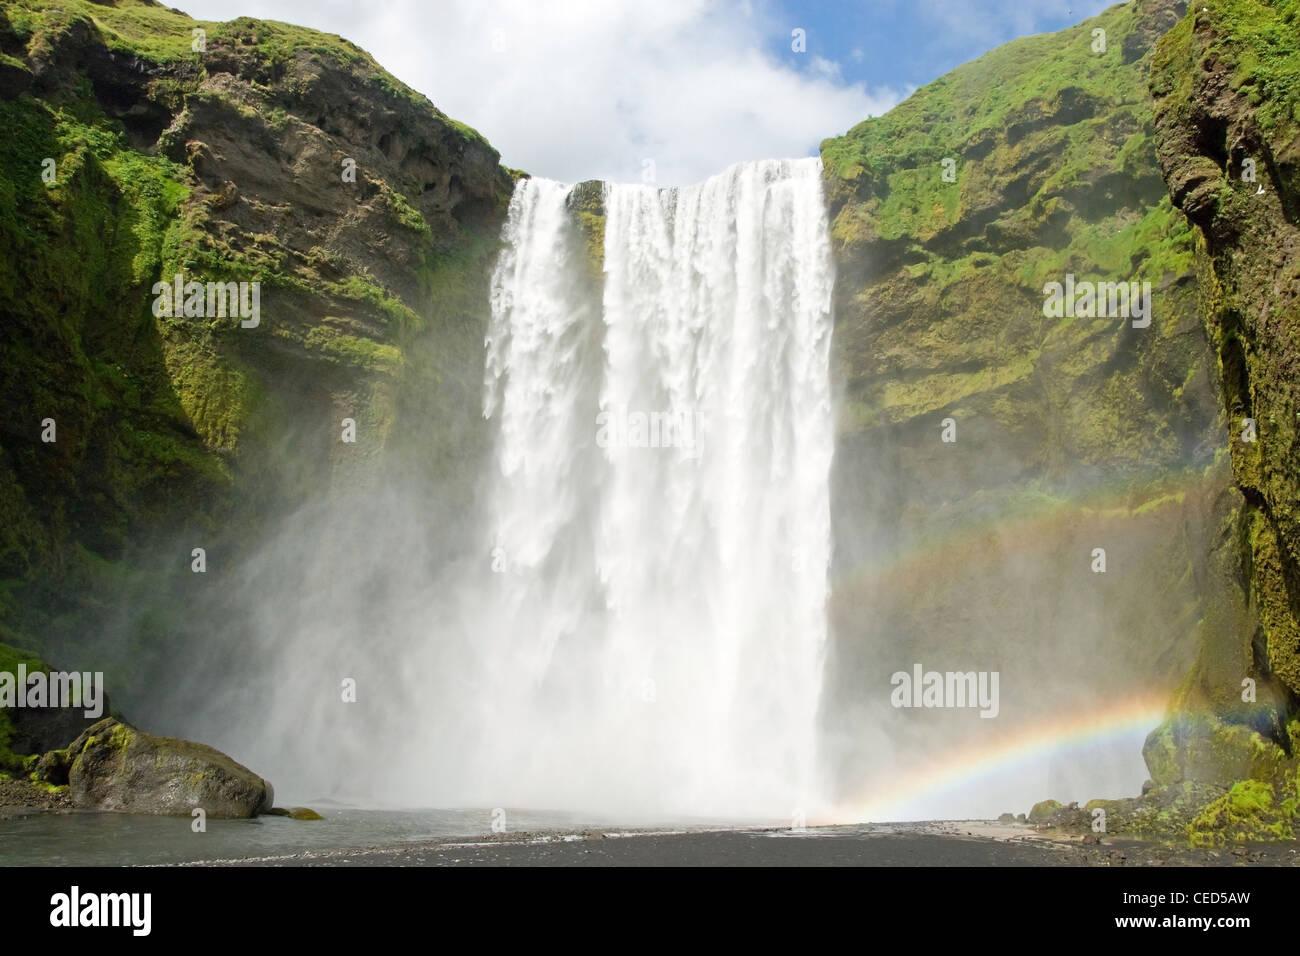 Skogarfoss fall on the Iceland with a rainbow - Stock Image